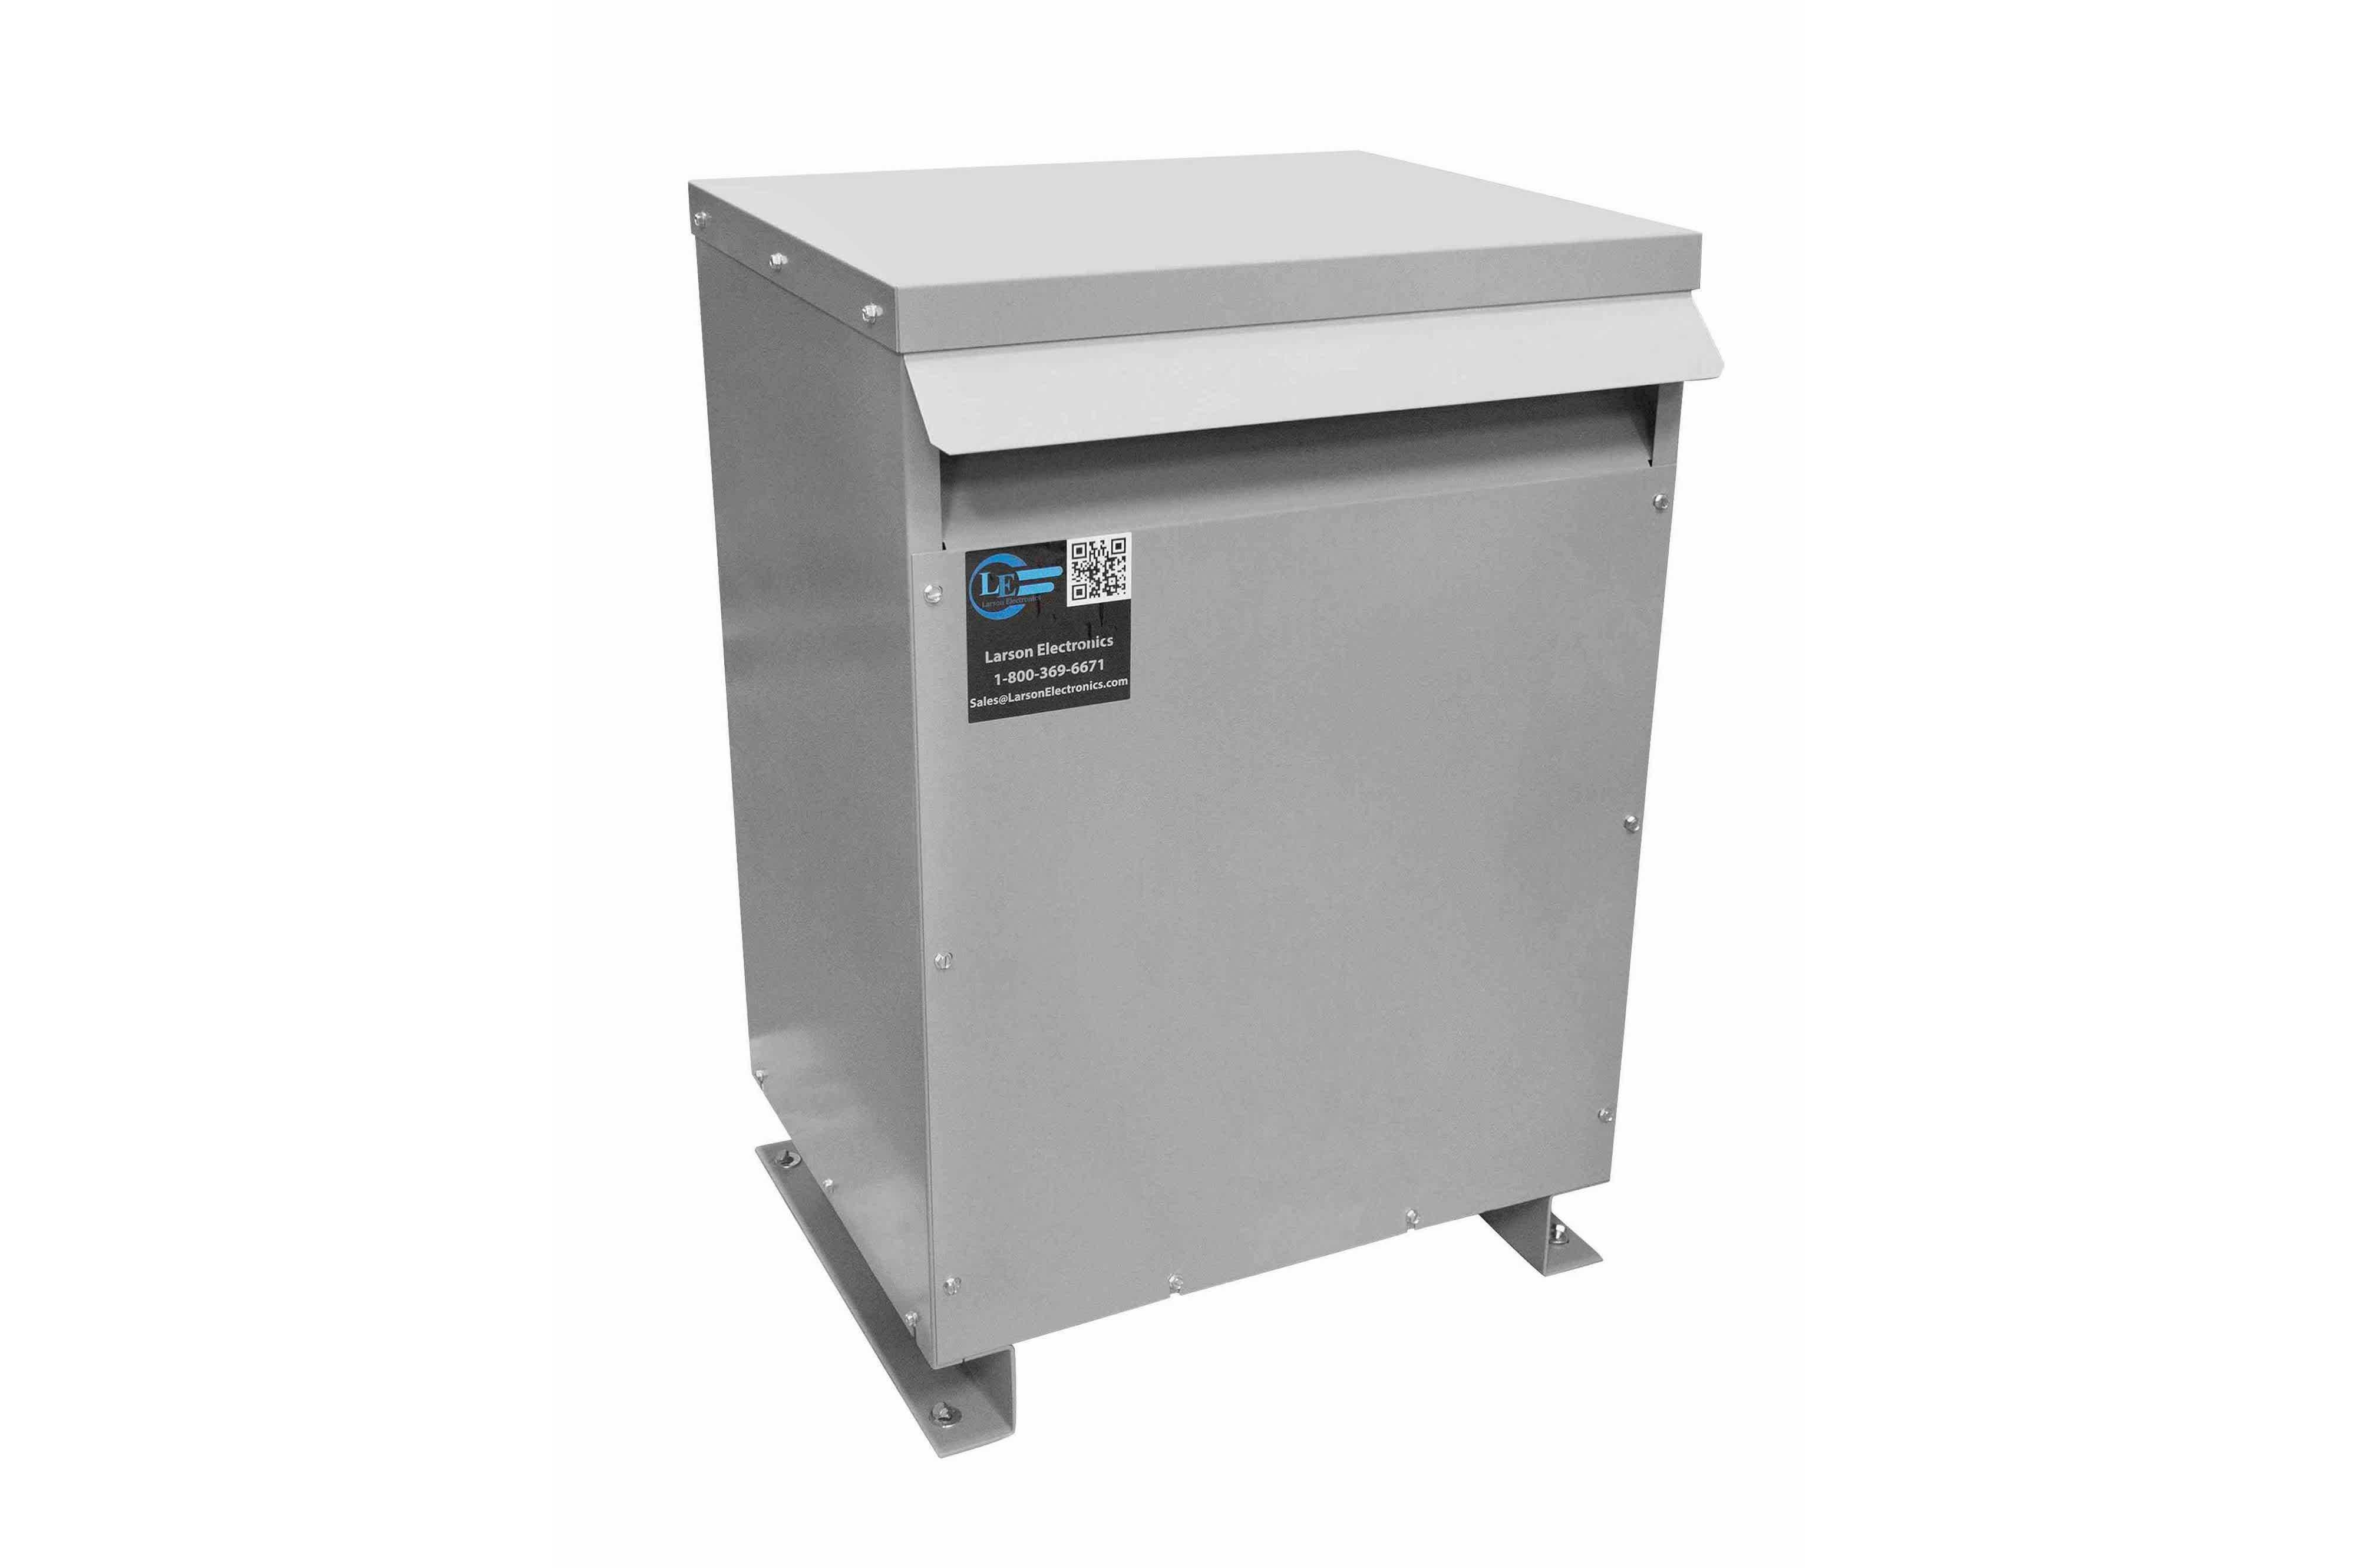 110 kVA 3PH Isolation Transformer, 480V Wye Primary, 240V/120 Delta Secondary, N3R, Ventilated, 60 Hz